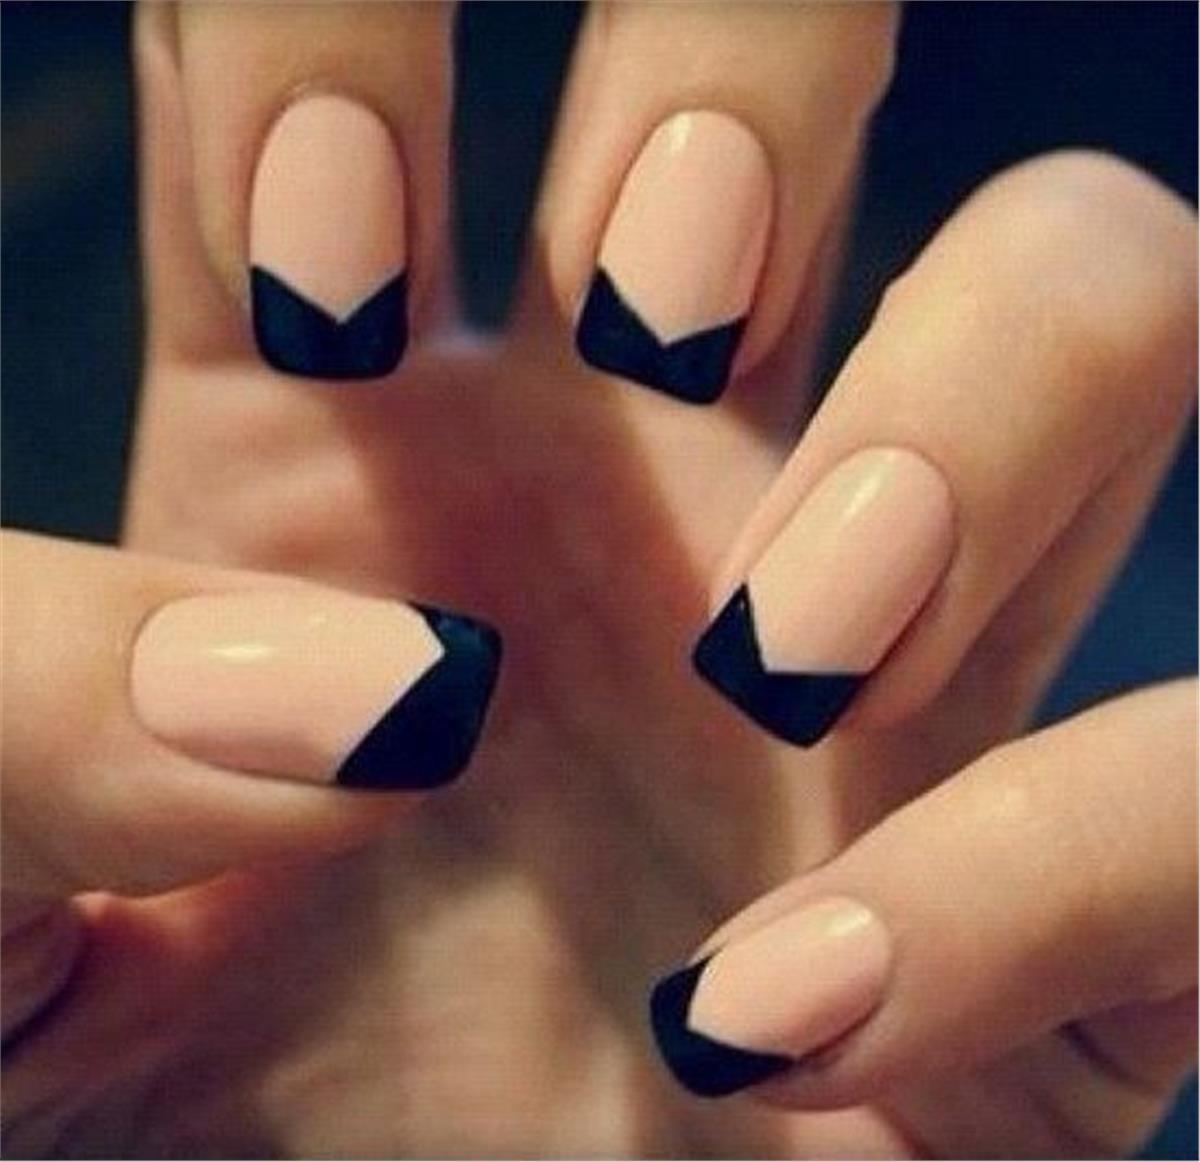 black tip nails tumblr - photo #37